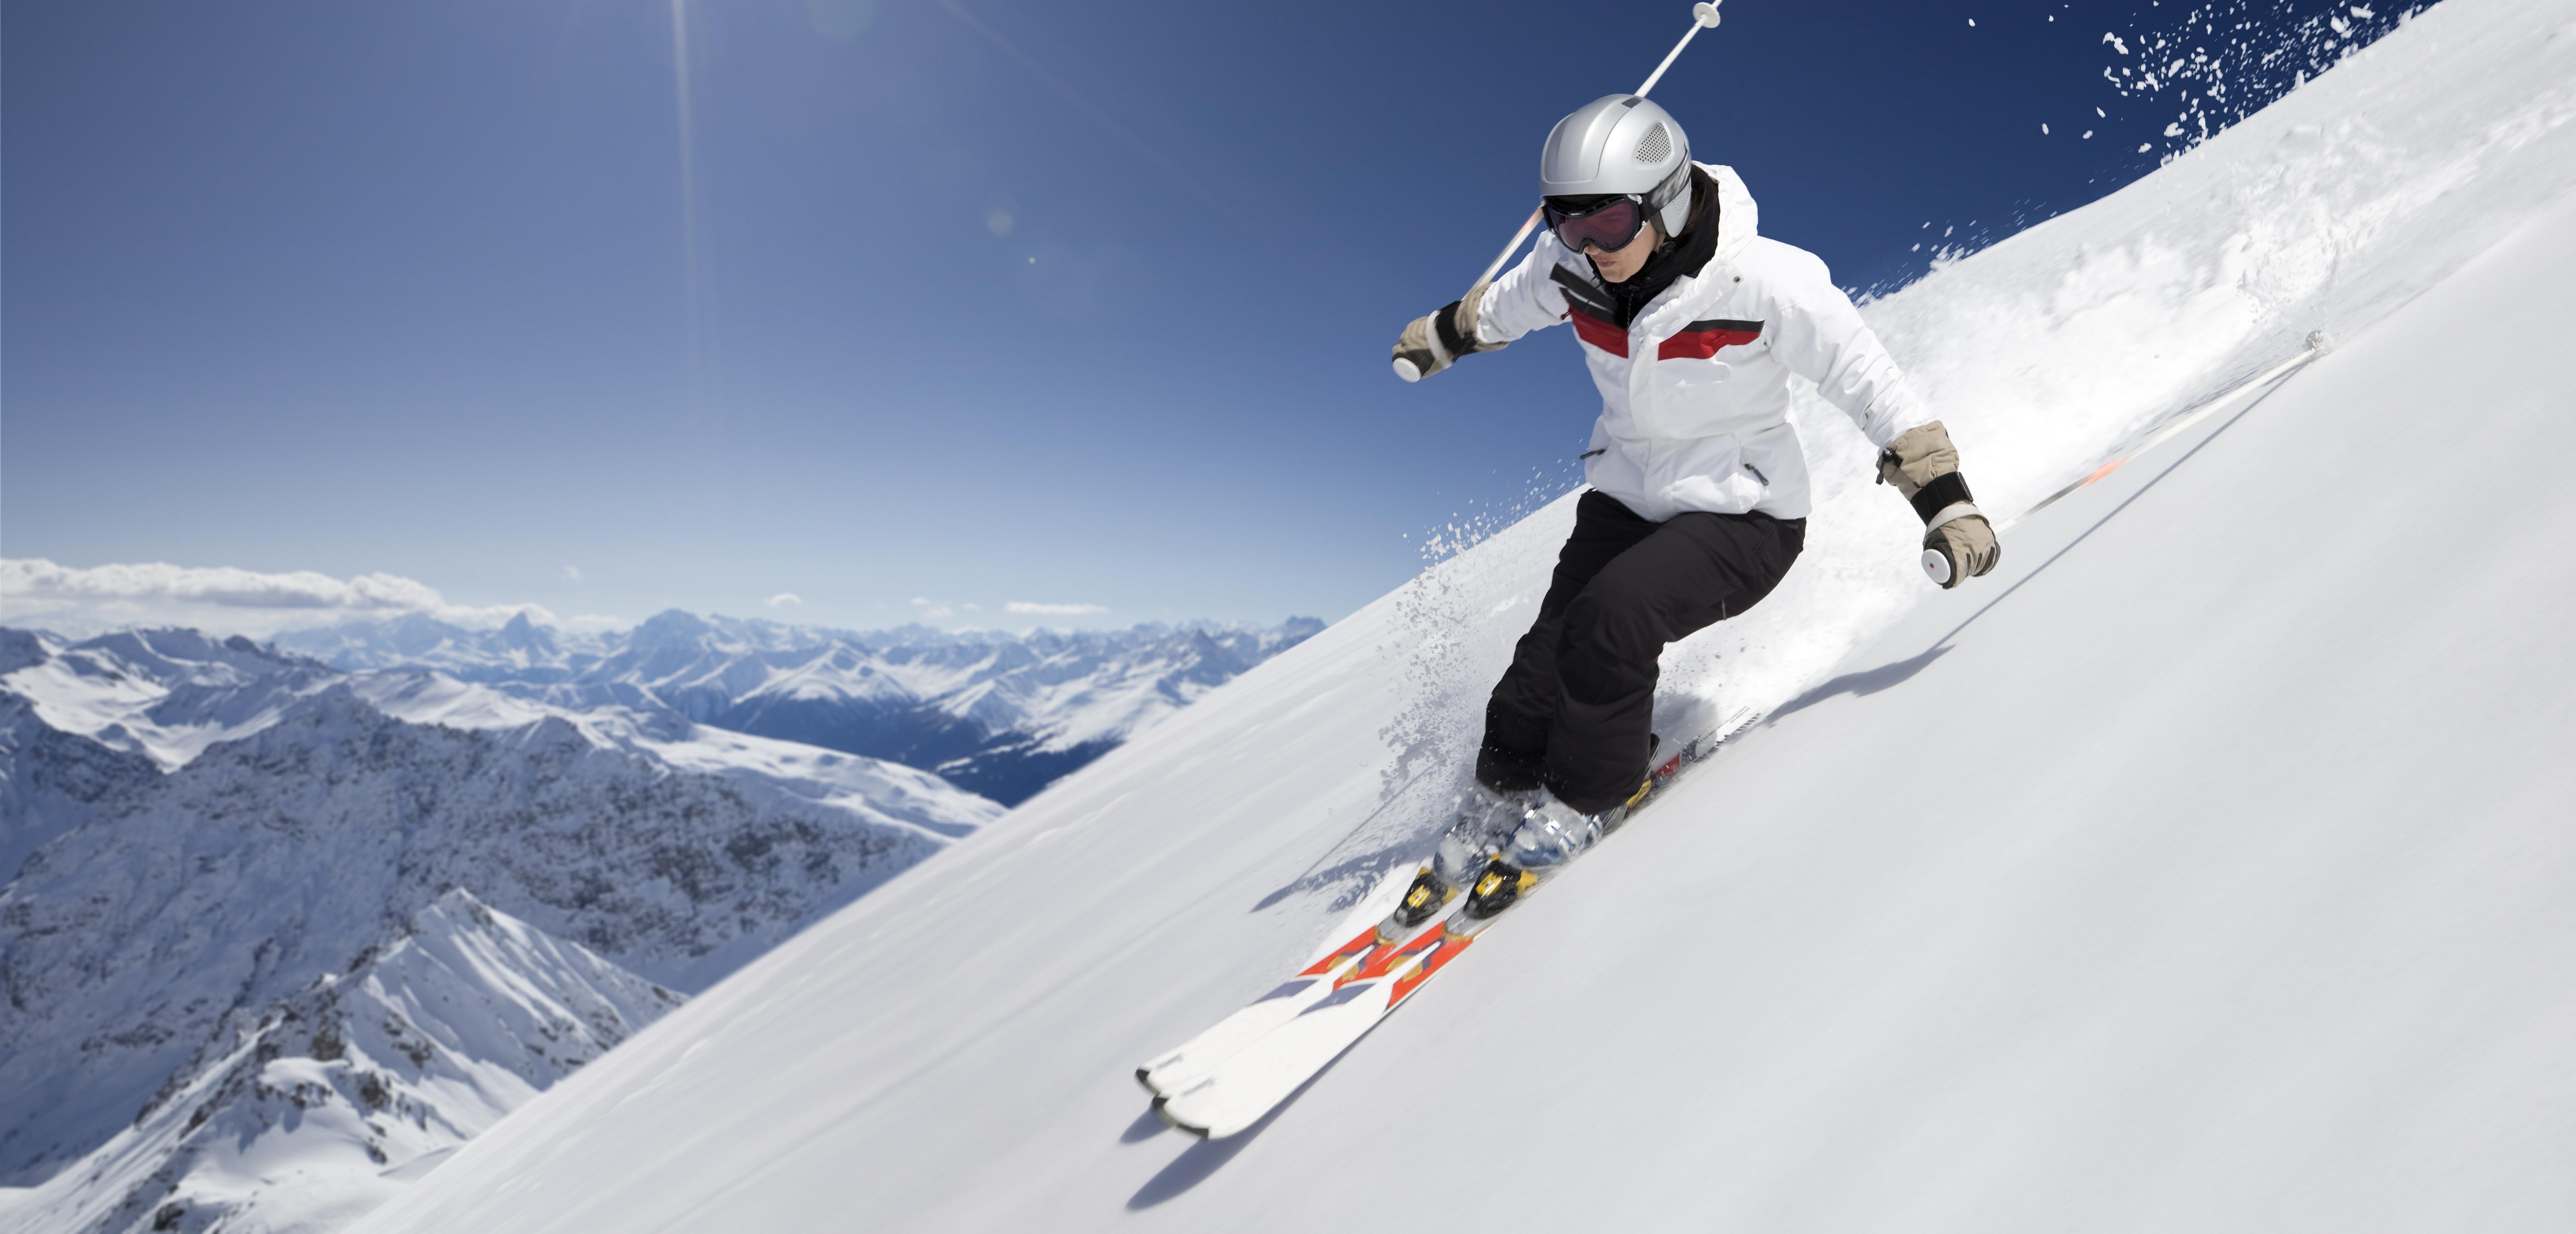 skiier - SportsCover Direct